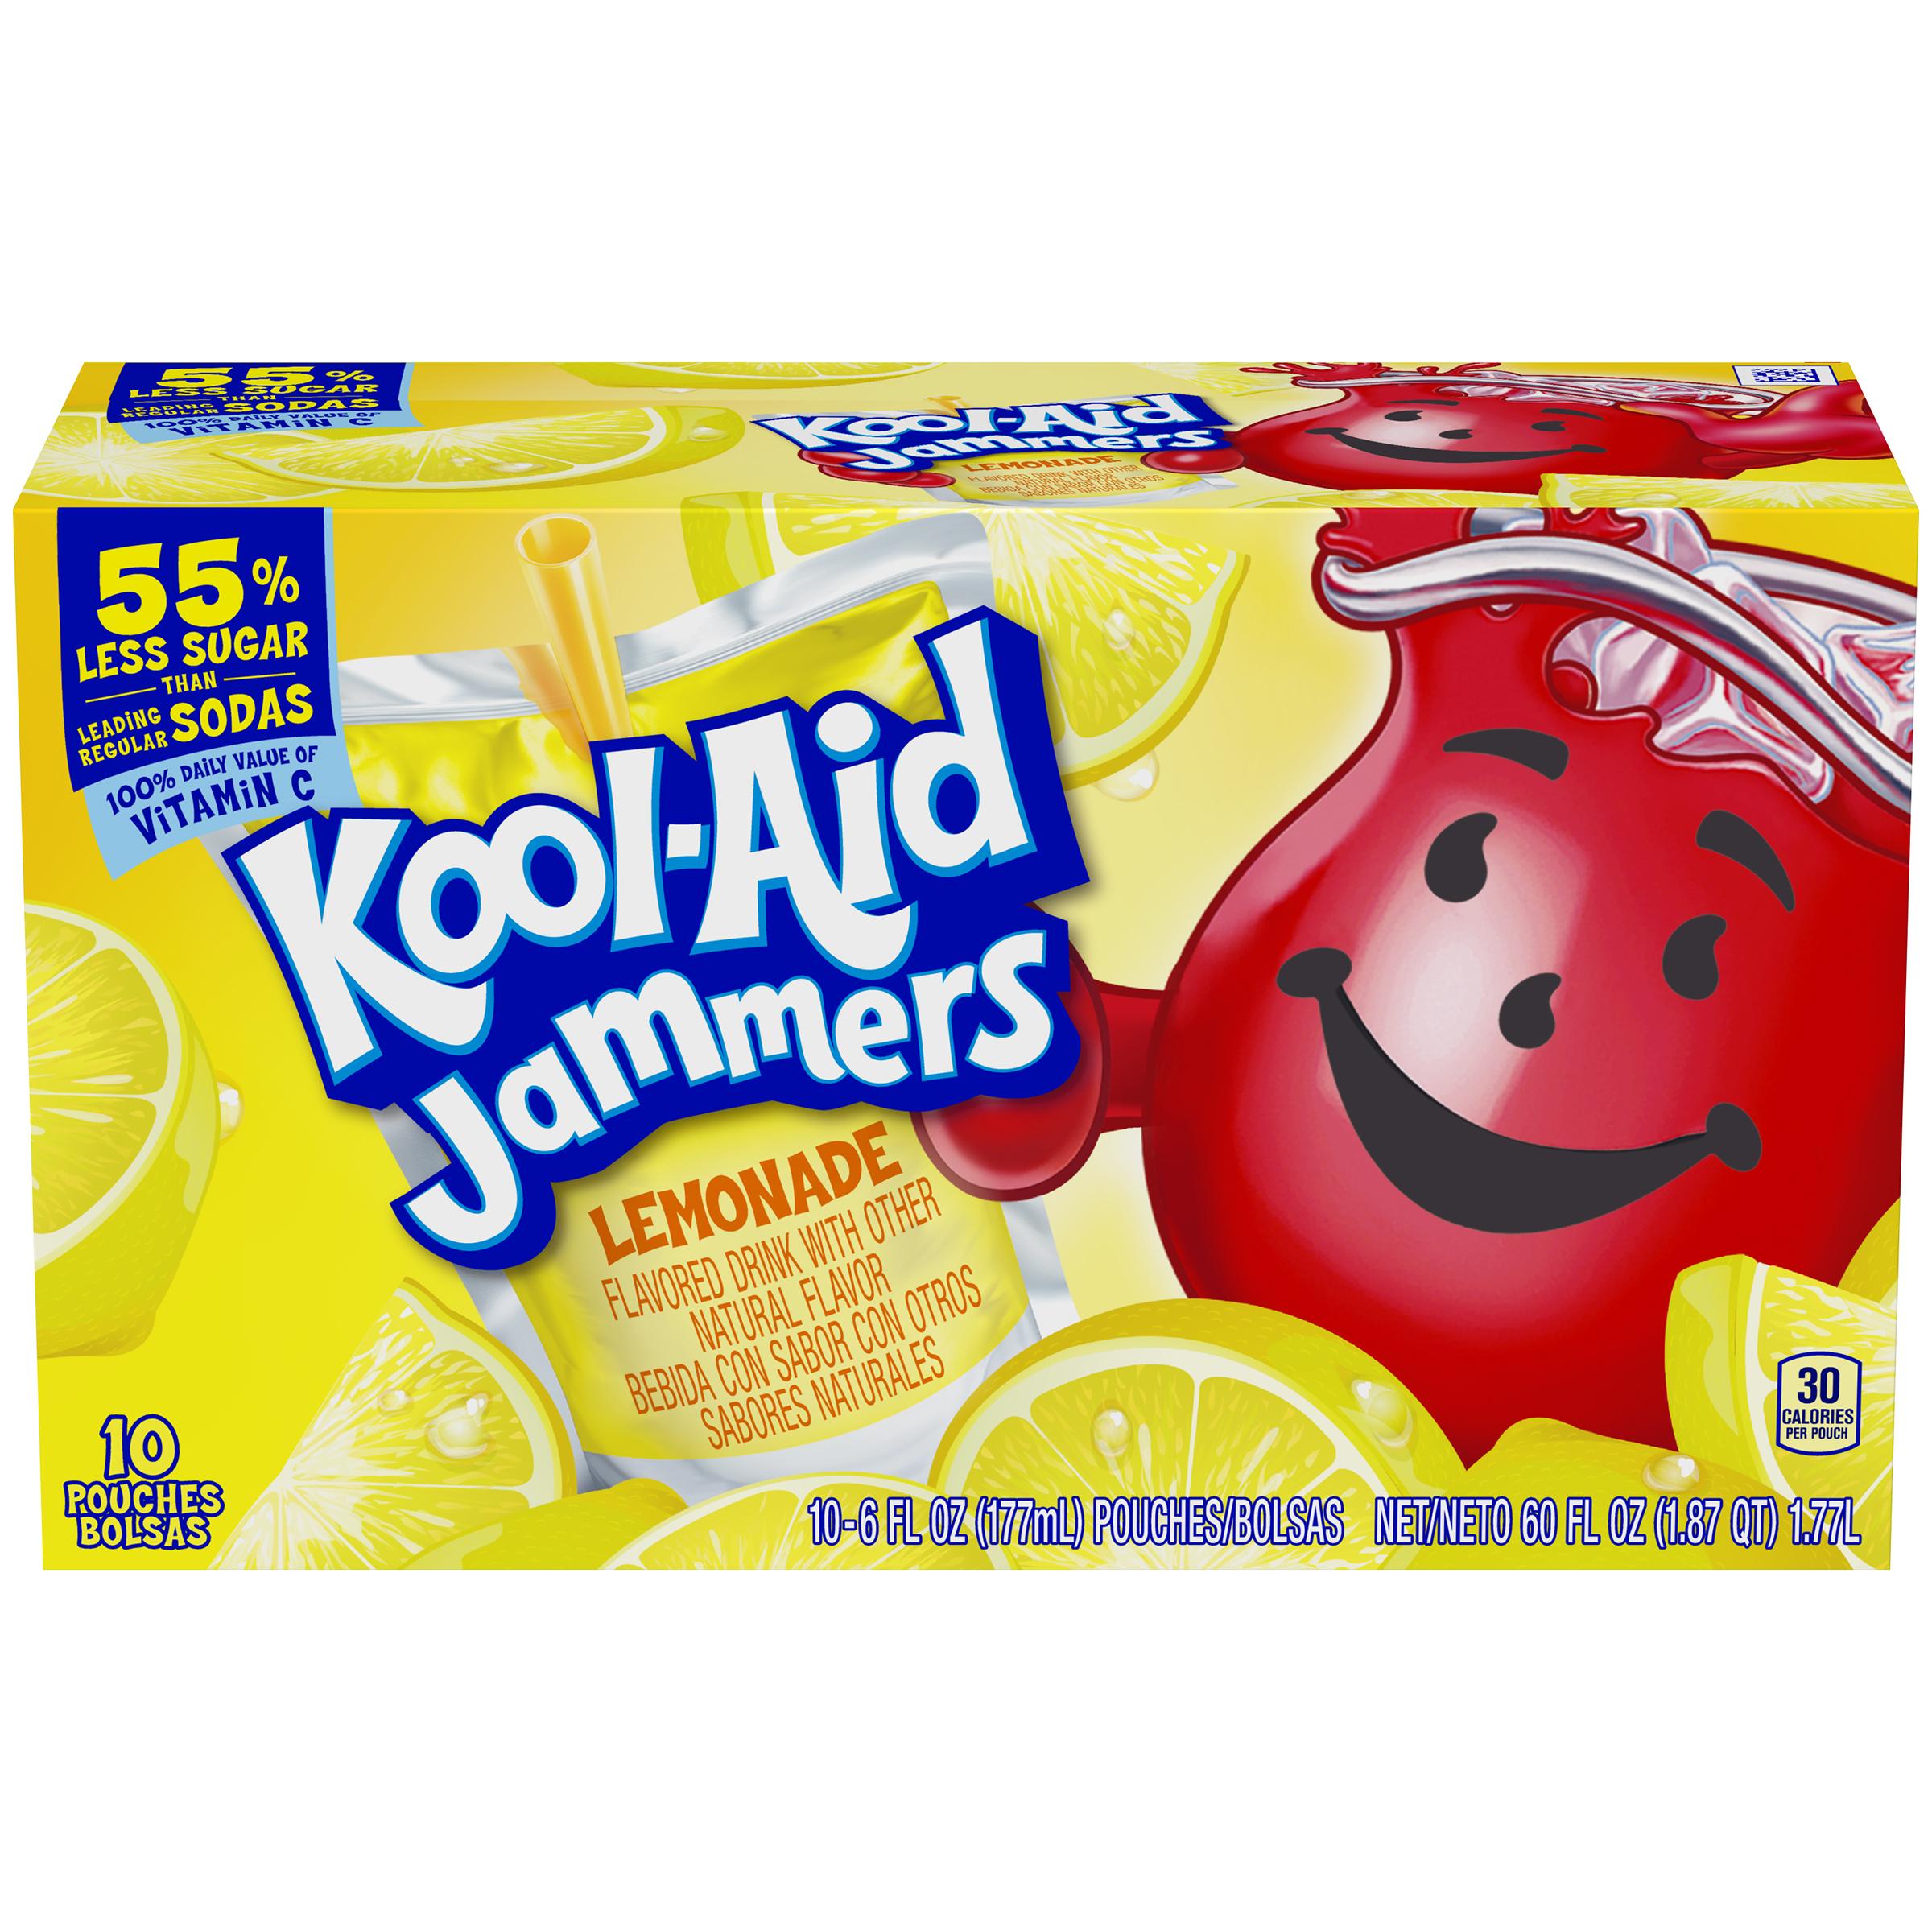 Kool-Aid Jammers Lemonade Flavored Drink 60 fl oz Box (10-6 fl oz Pouches) image